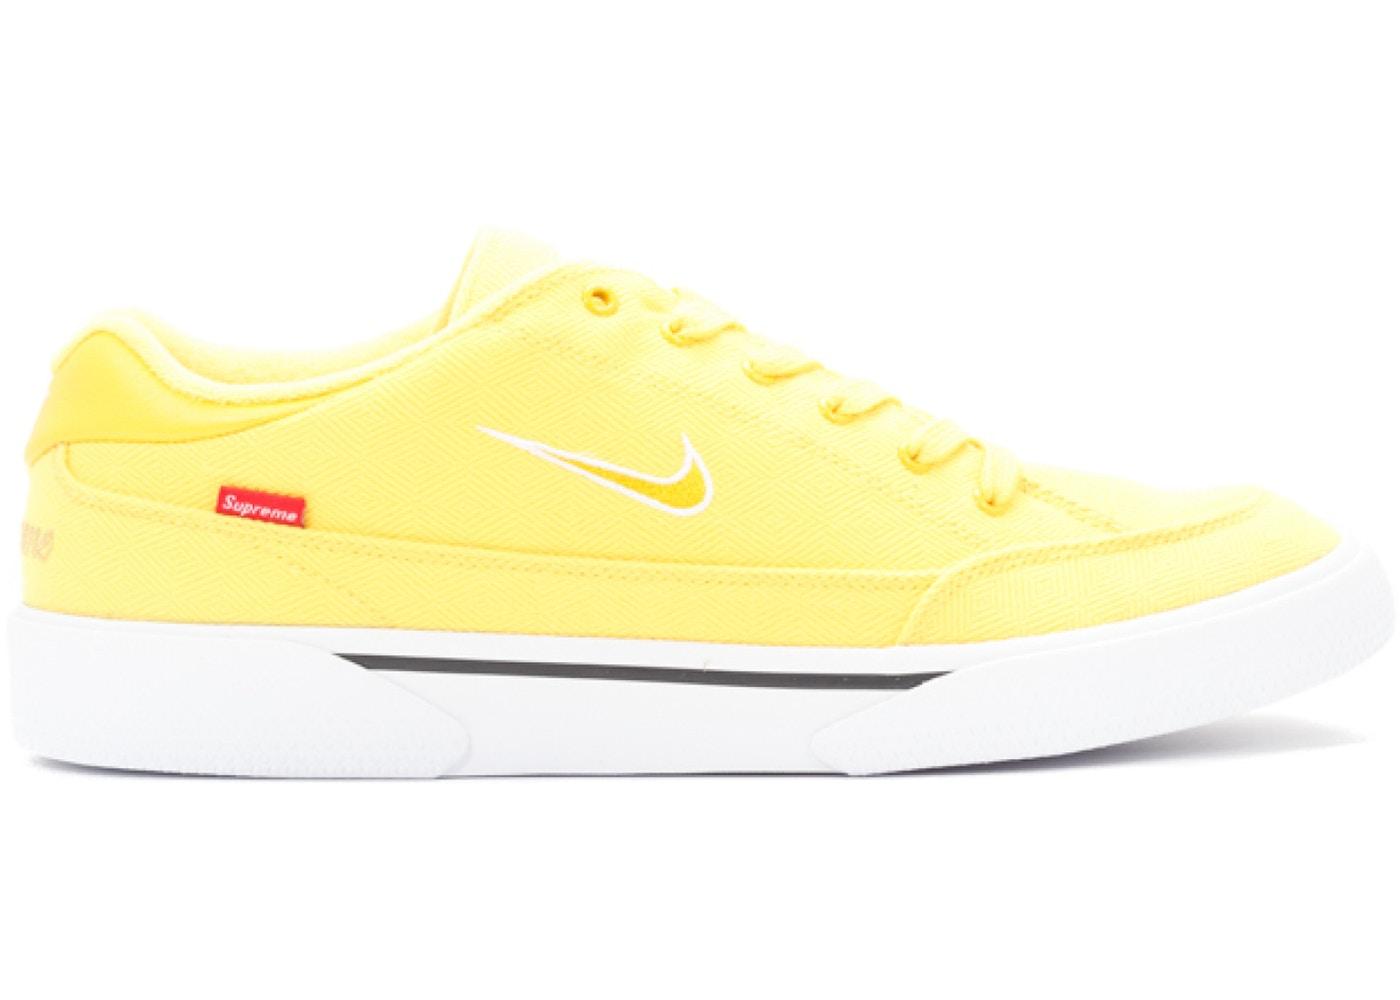 91c7cca4 Nike SB GTS Supreme Yellow - 801621-771